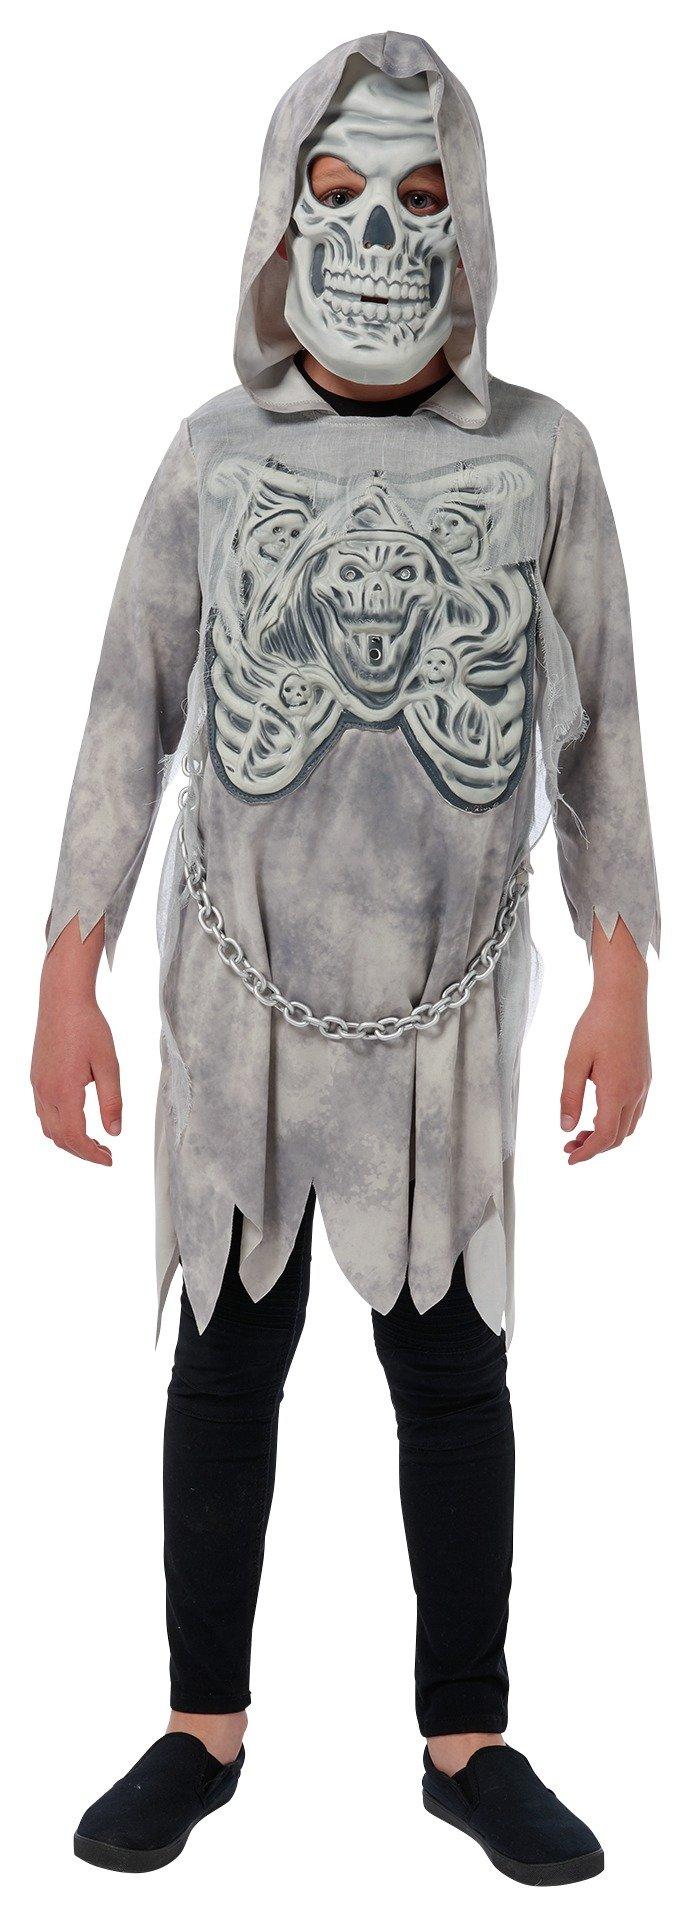 Image of Ghost Reaper Fancy Dress Costume - 5-6 Years.